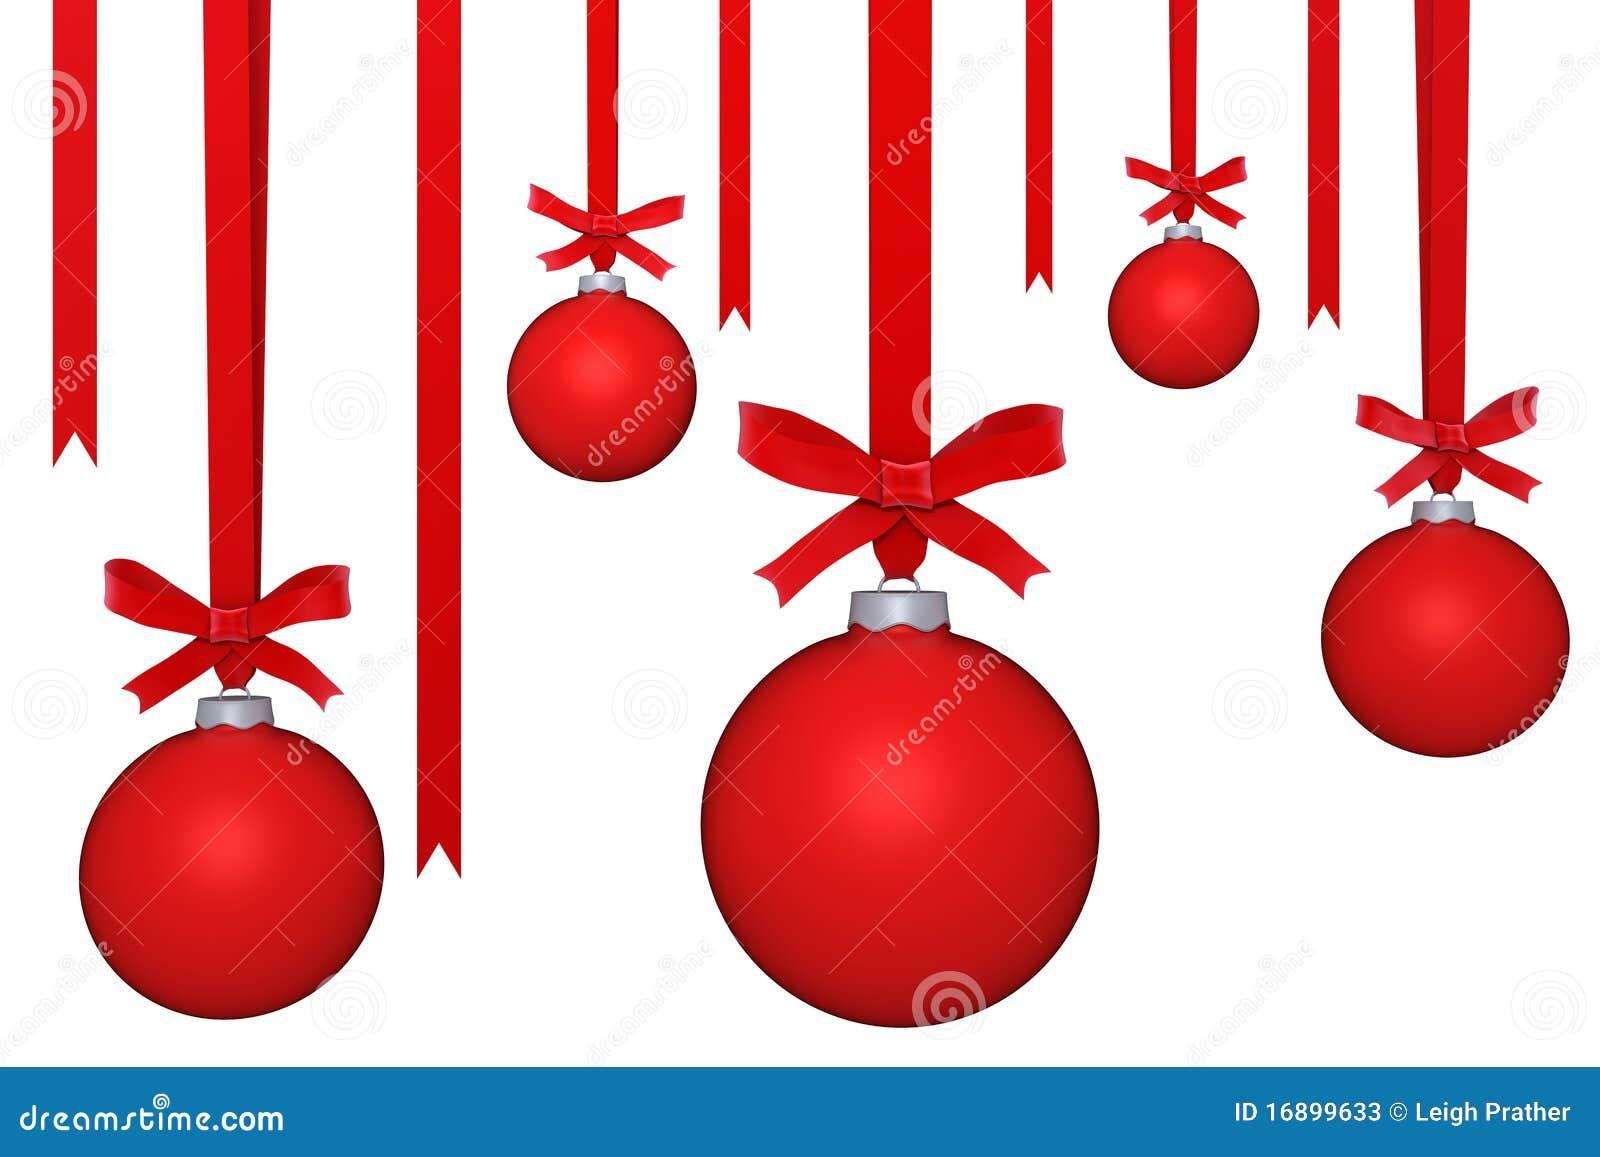 Hanging ornaments stock illustration of